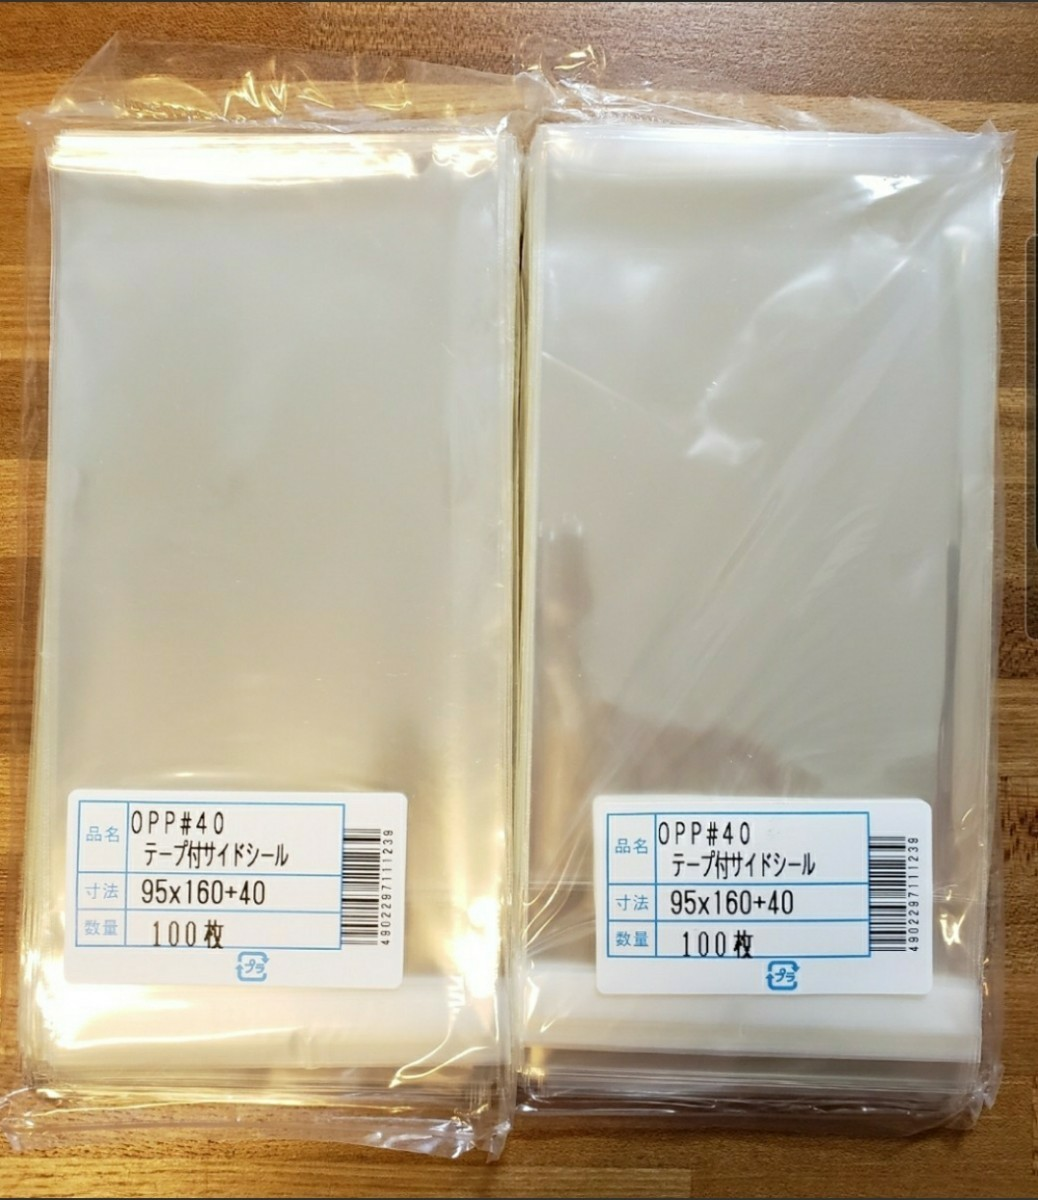 95mm×160mm+40mm テープ付き 400枚 OPP袋 ラッピング